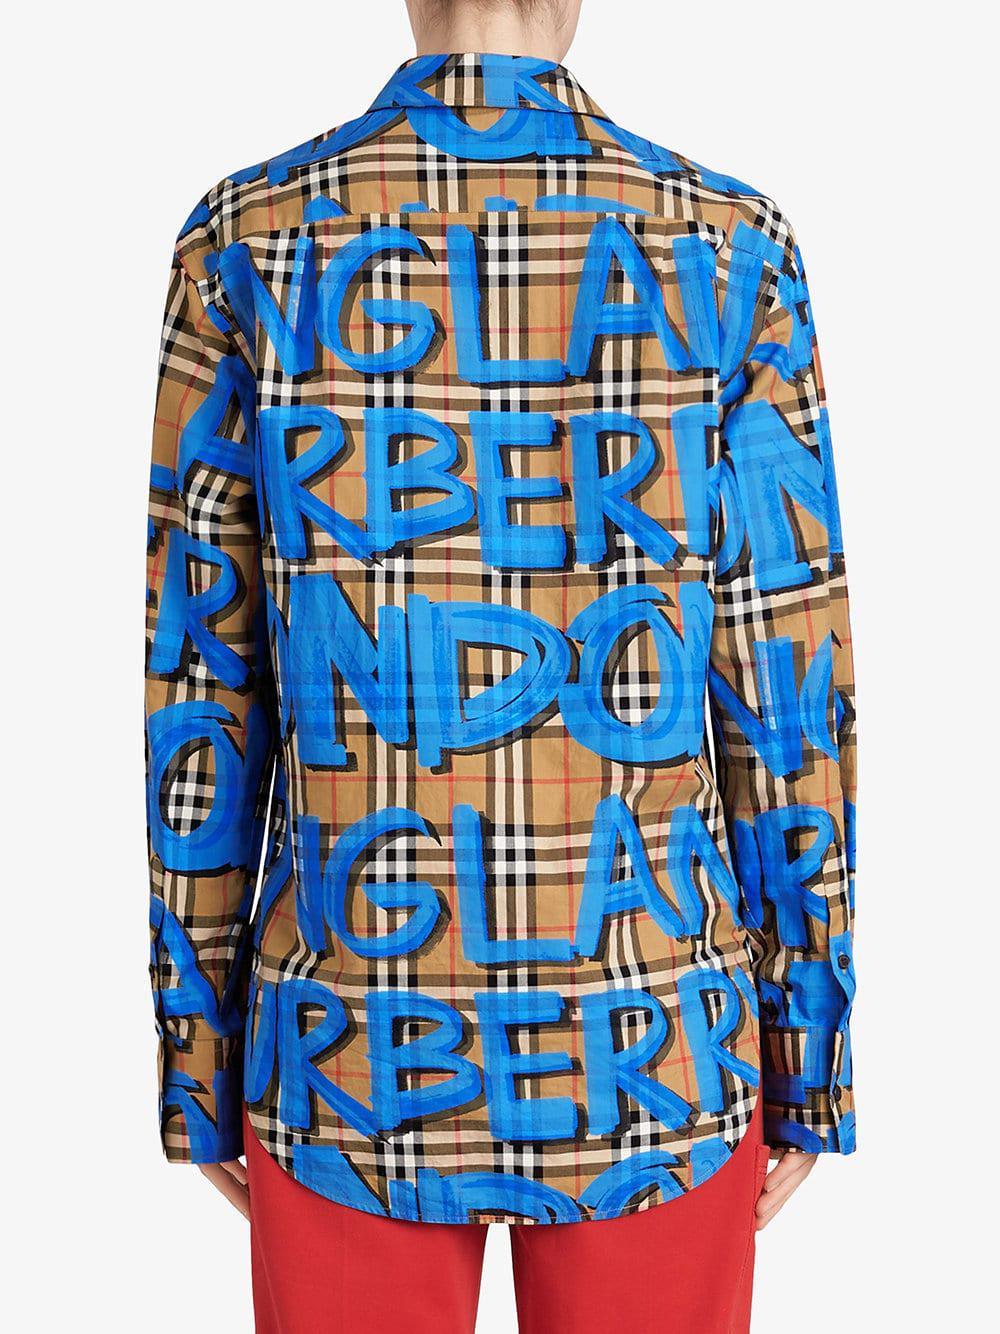 b529dce307e8 Lyst - Burberry Graffiti-print Check Shirt in Blue